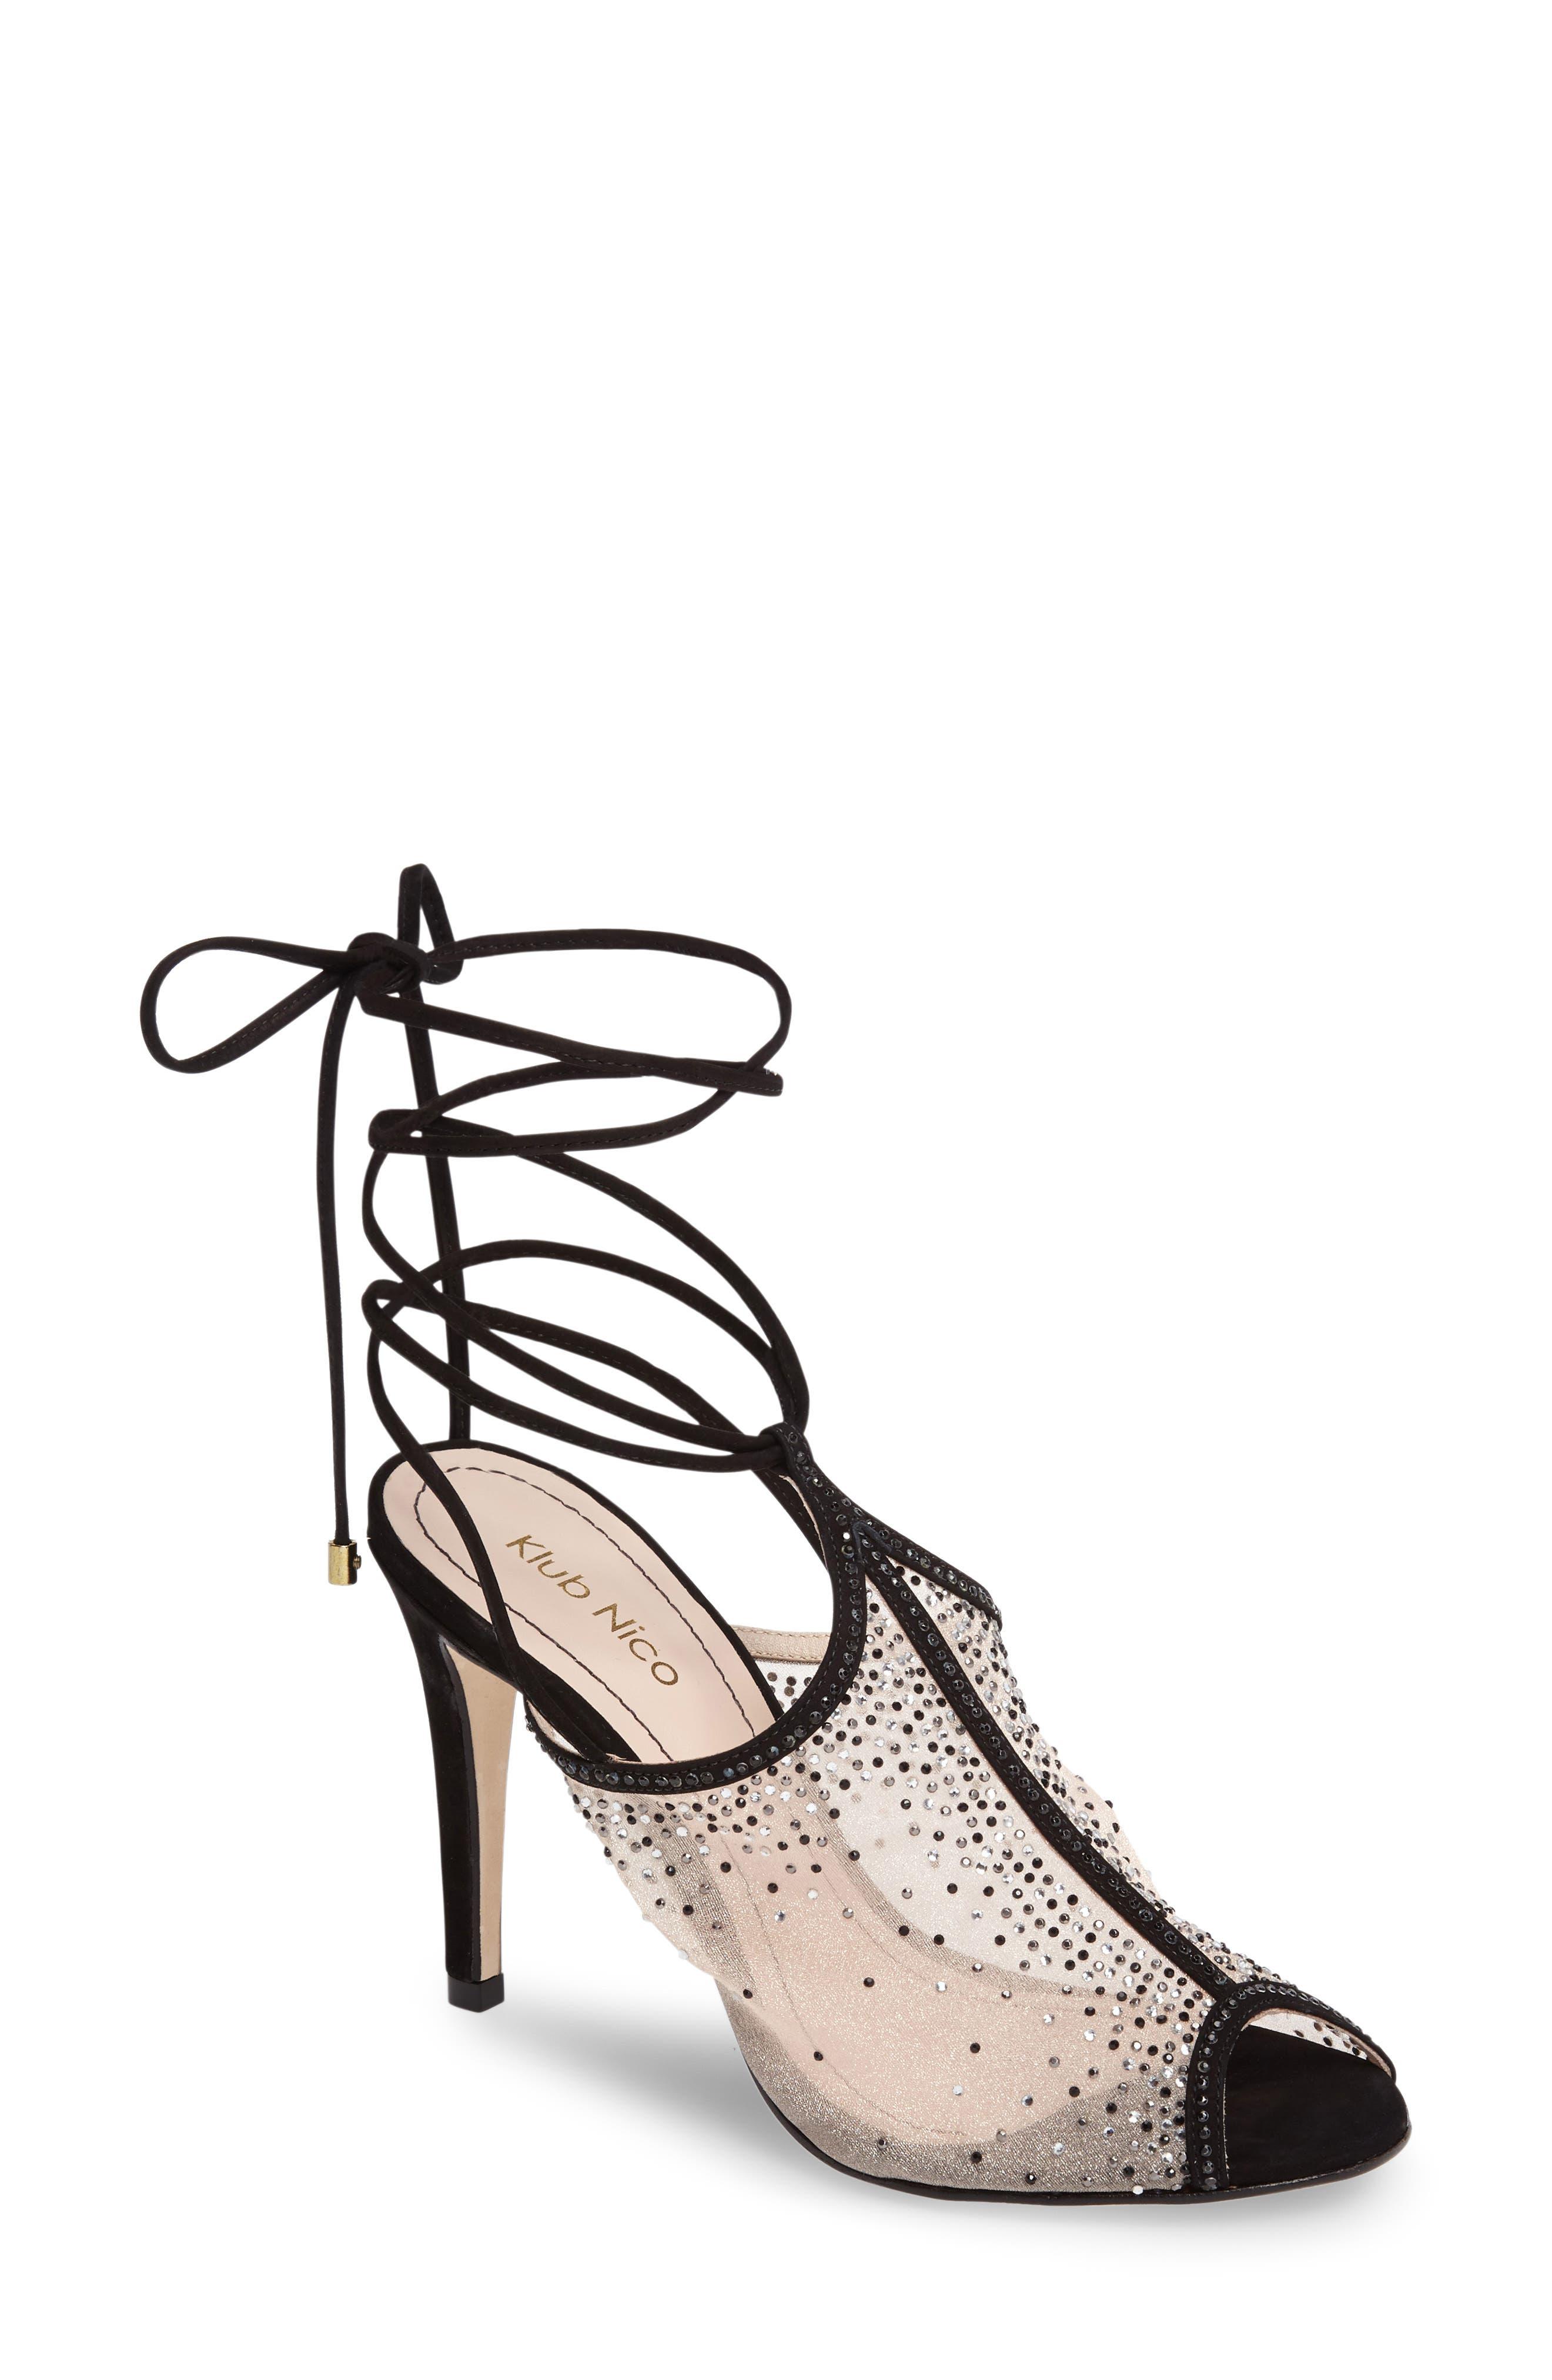 Margeaux Embellished Wraparound Sandal,                         Main,                         color, 002